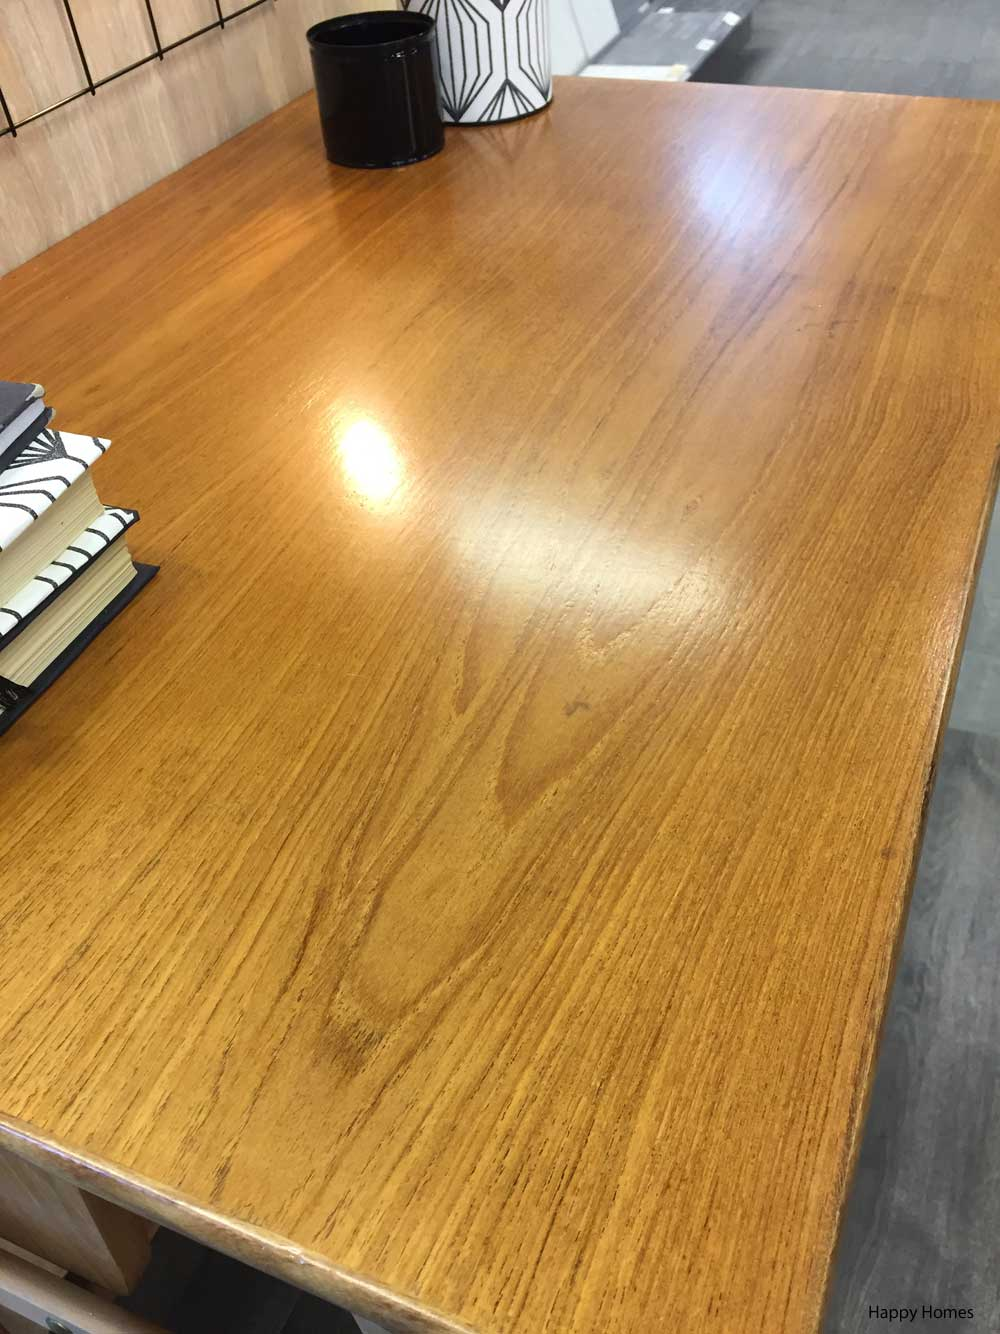 Oppussing av gammelt skrivebord